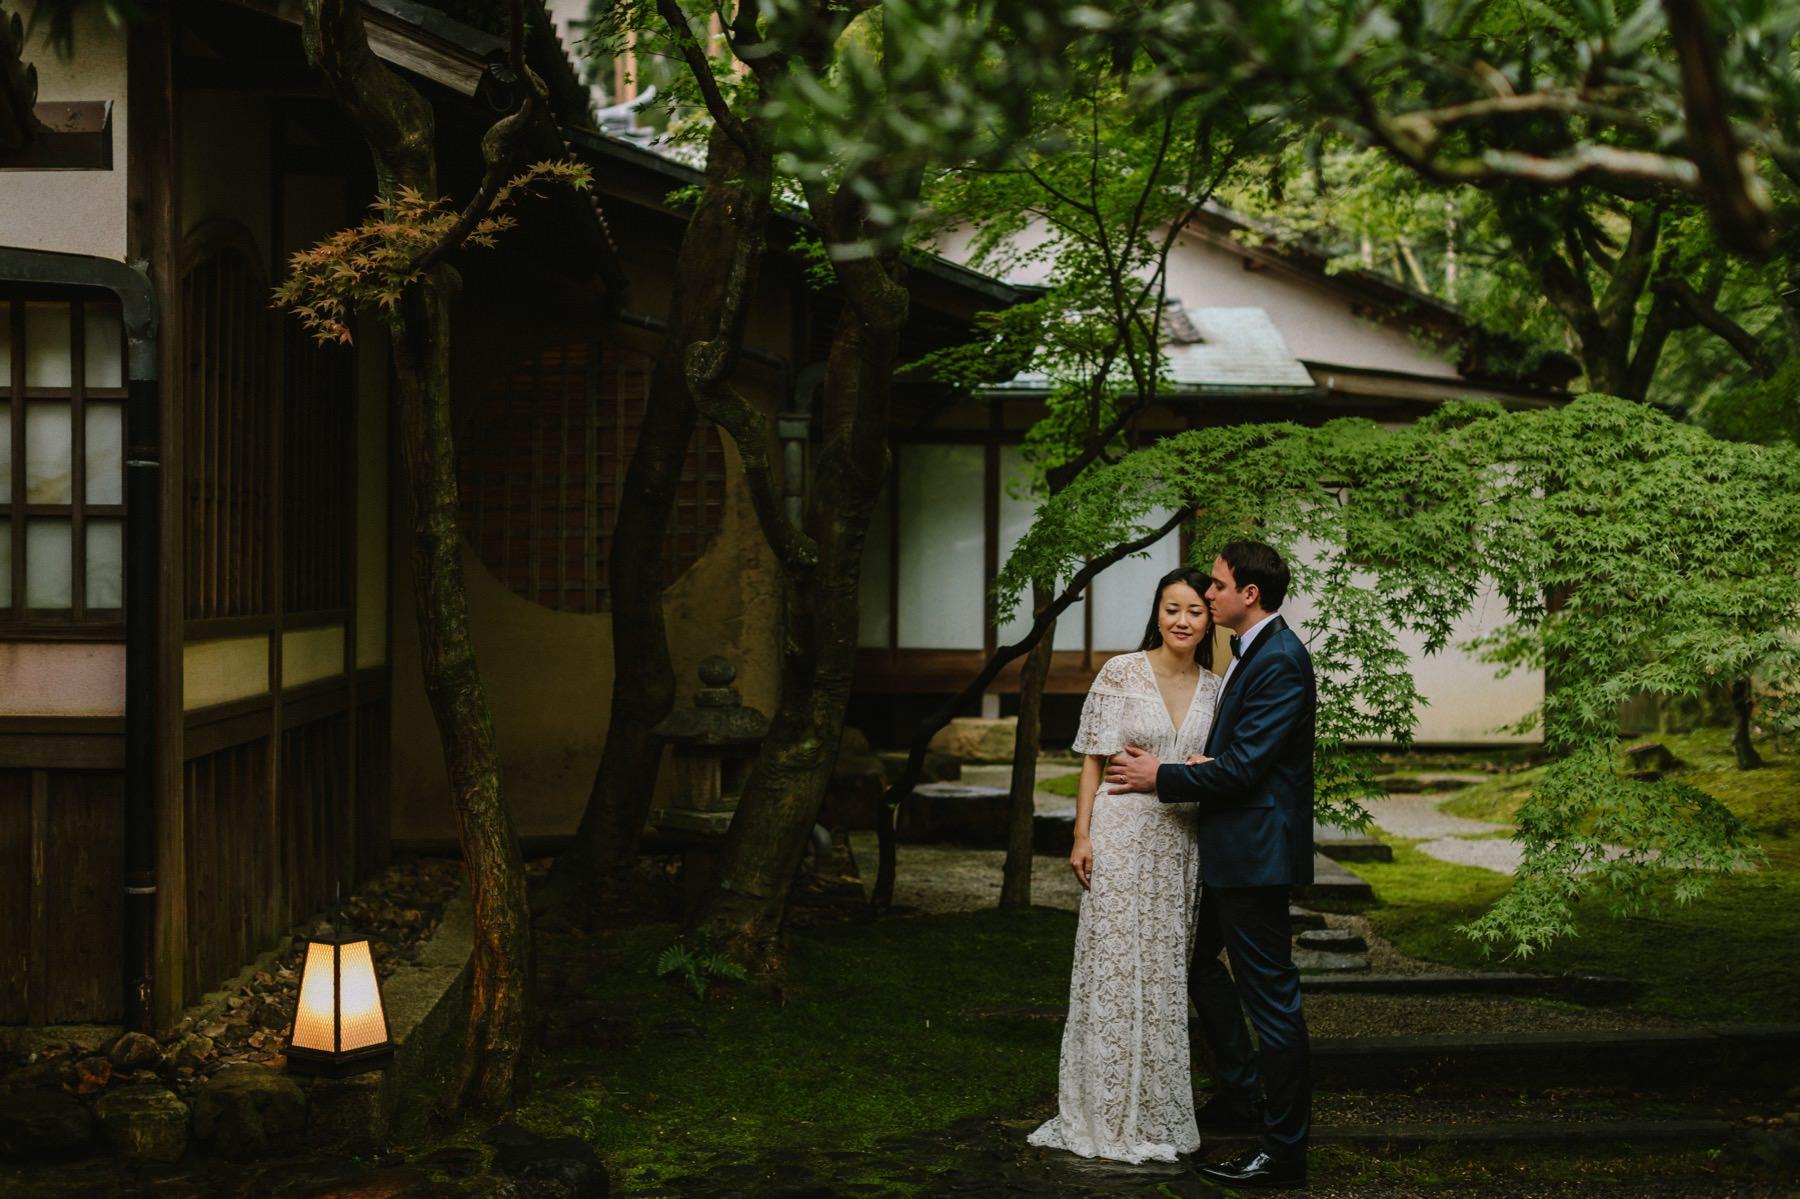 Shozan Resort Japanese garden wedding